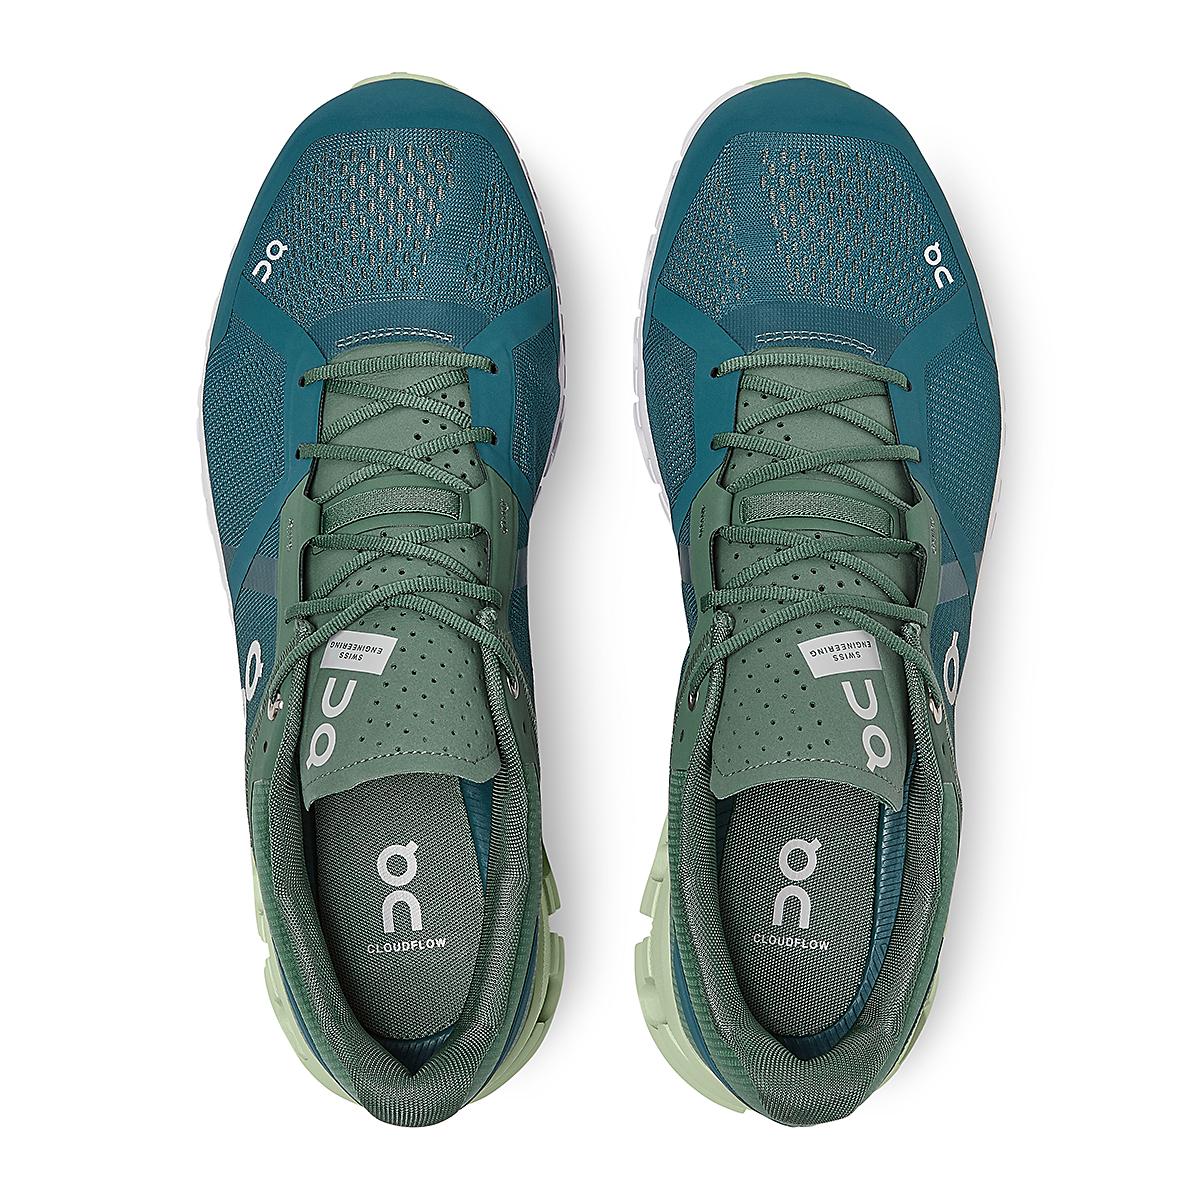 Men's On Cloudflow 2.0 Running Shoe - Color: Sea/Petrol - Size: 7 - Width: Regular, Sea/Petrol, large, image 3